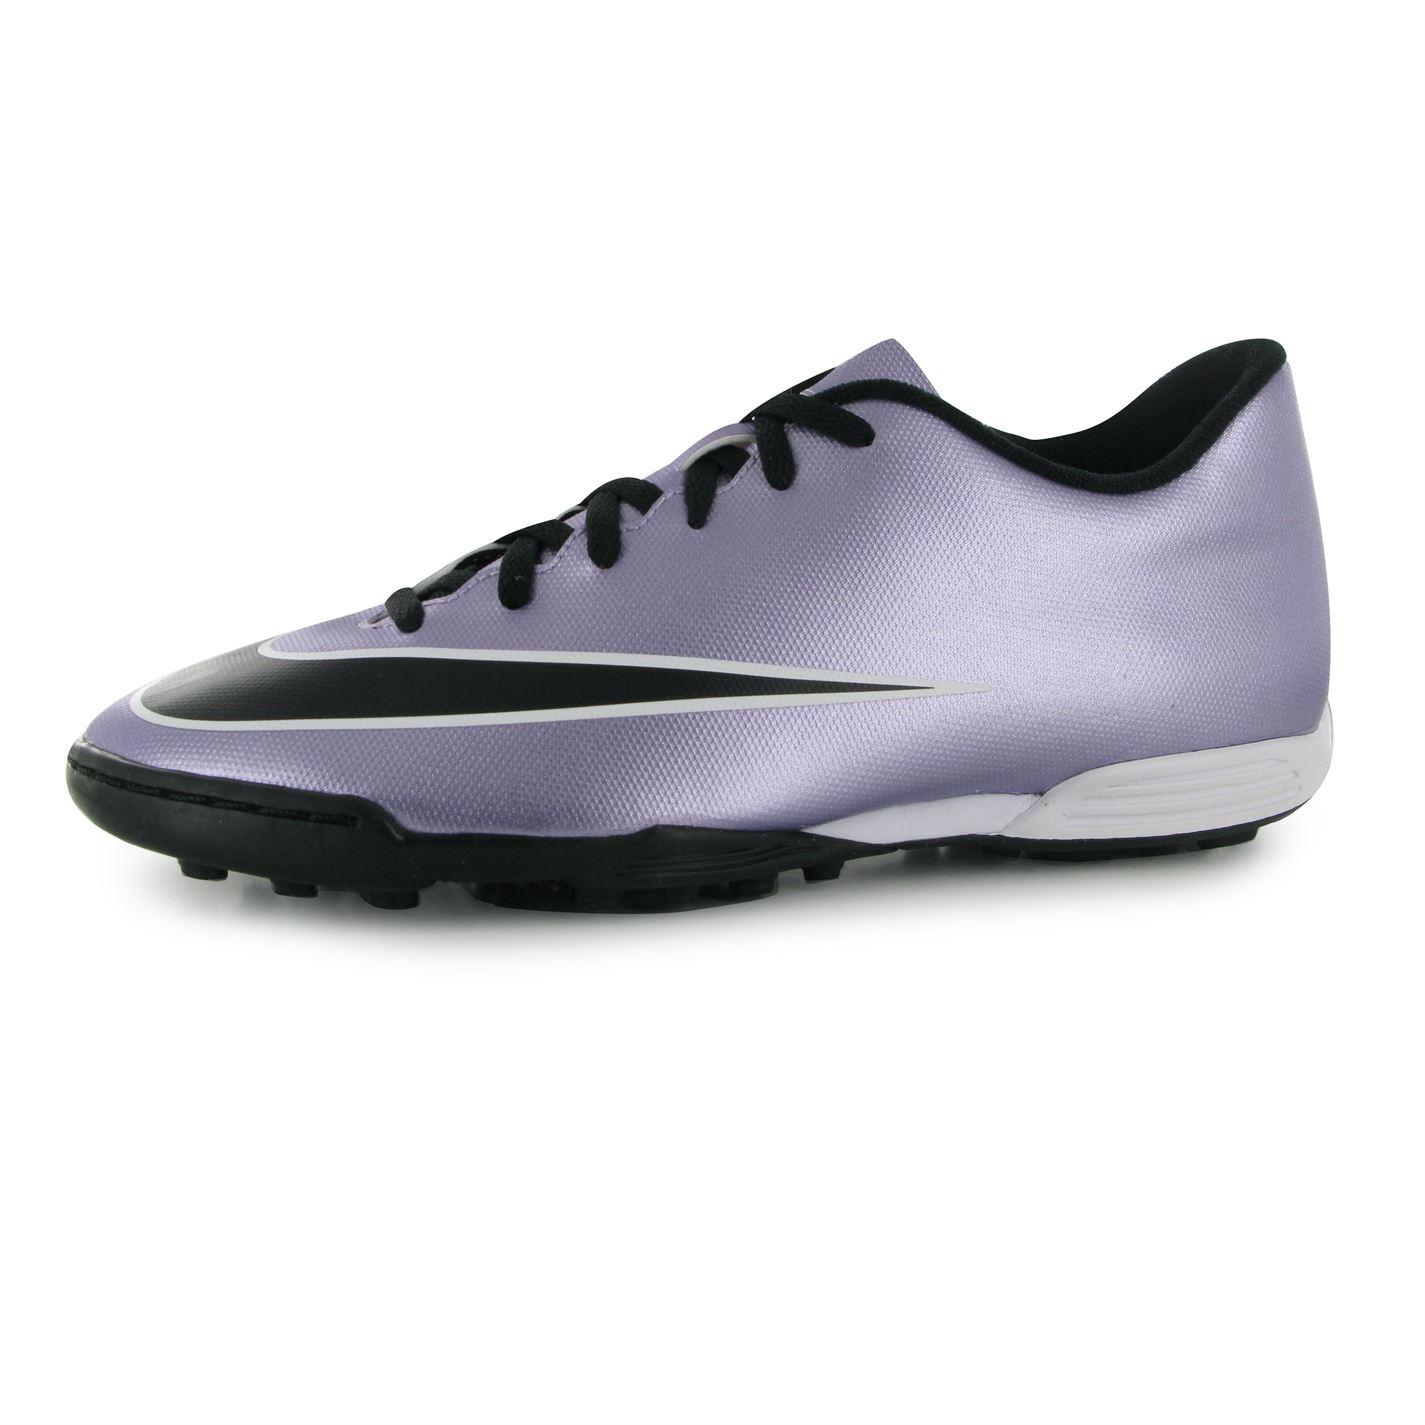 Adidasi Gazon Sintetic Adidasi Fotbal Nike Mercuri